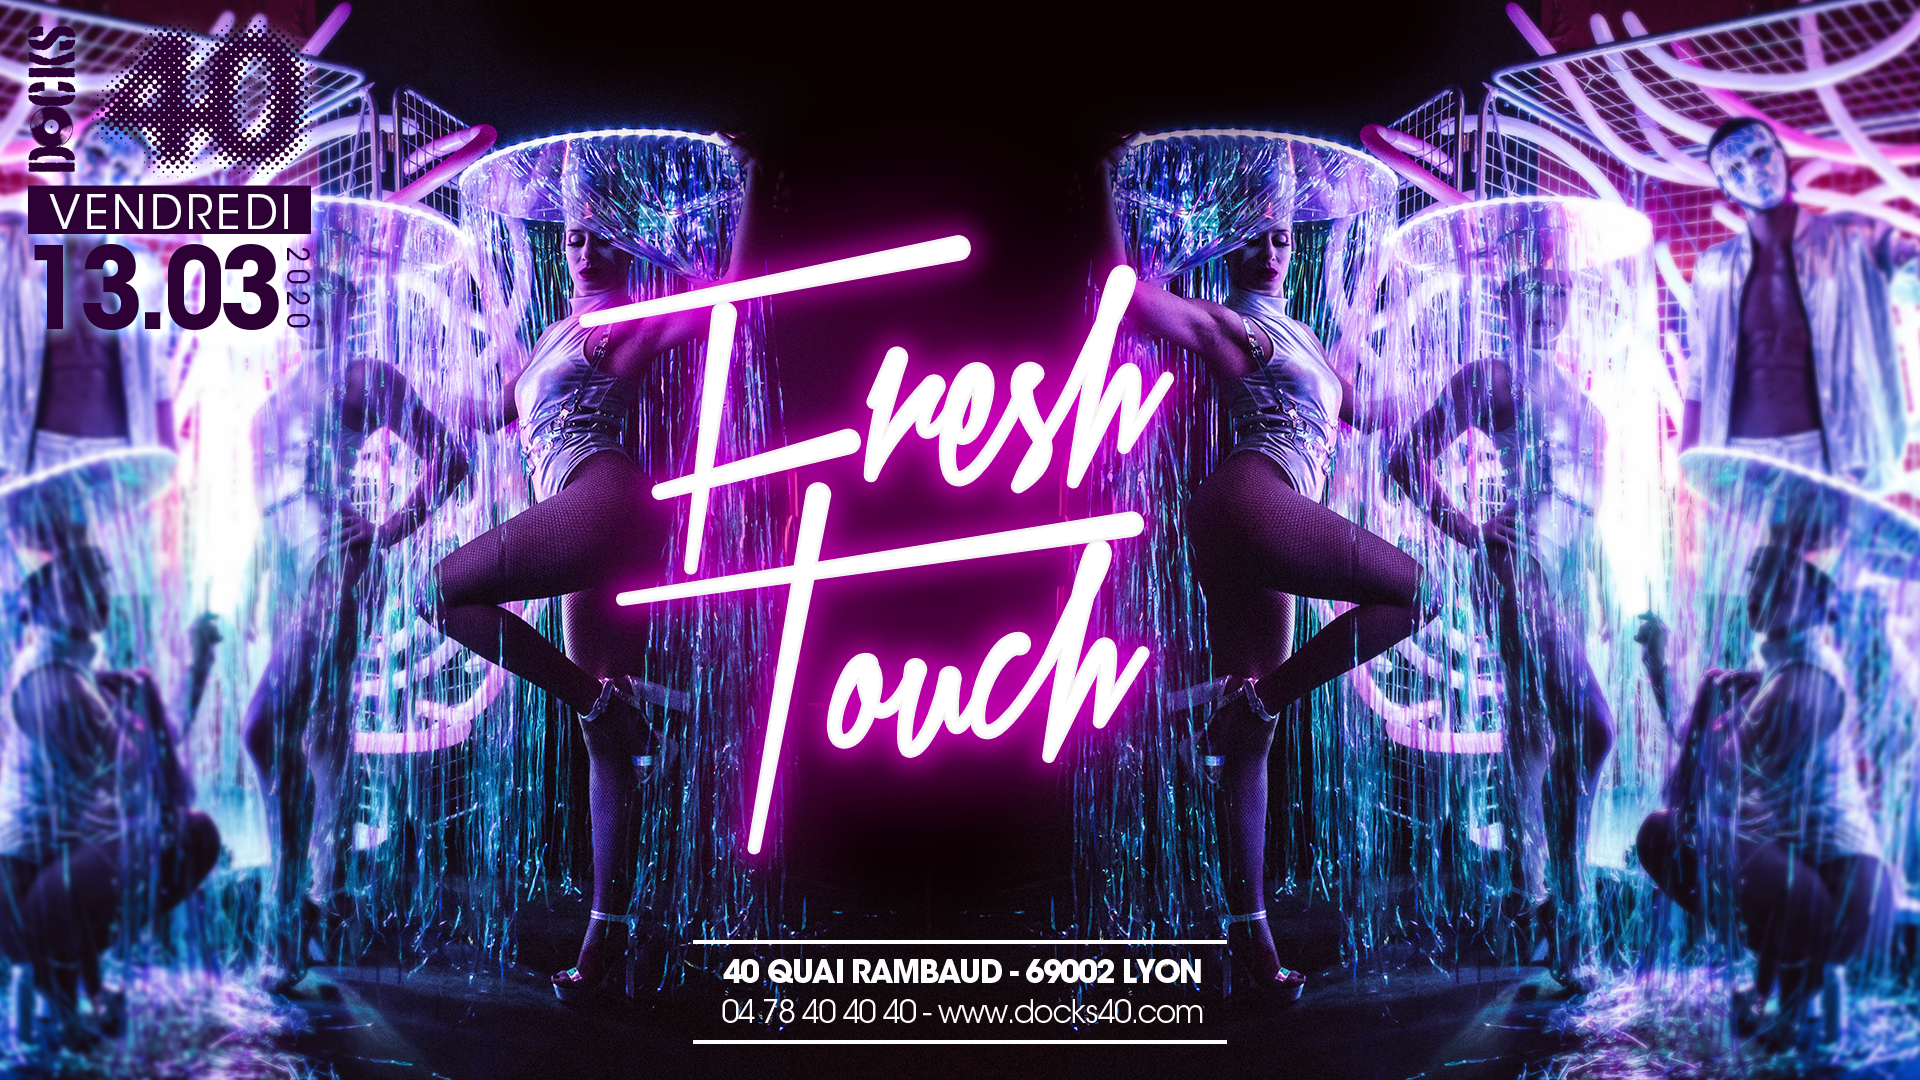 Fresh Touch - Docks 40